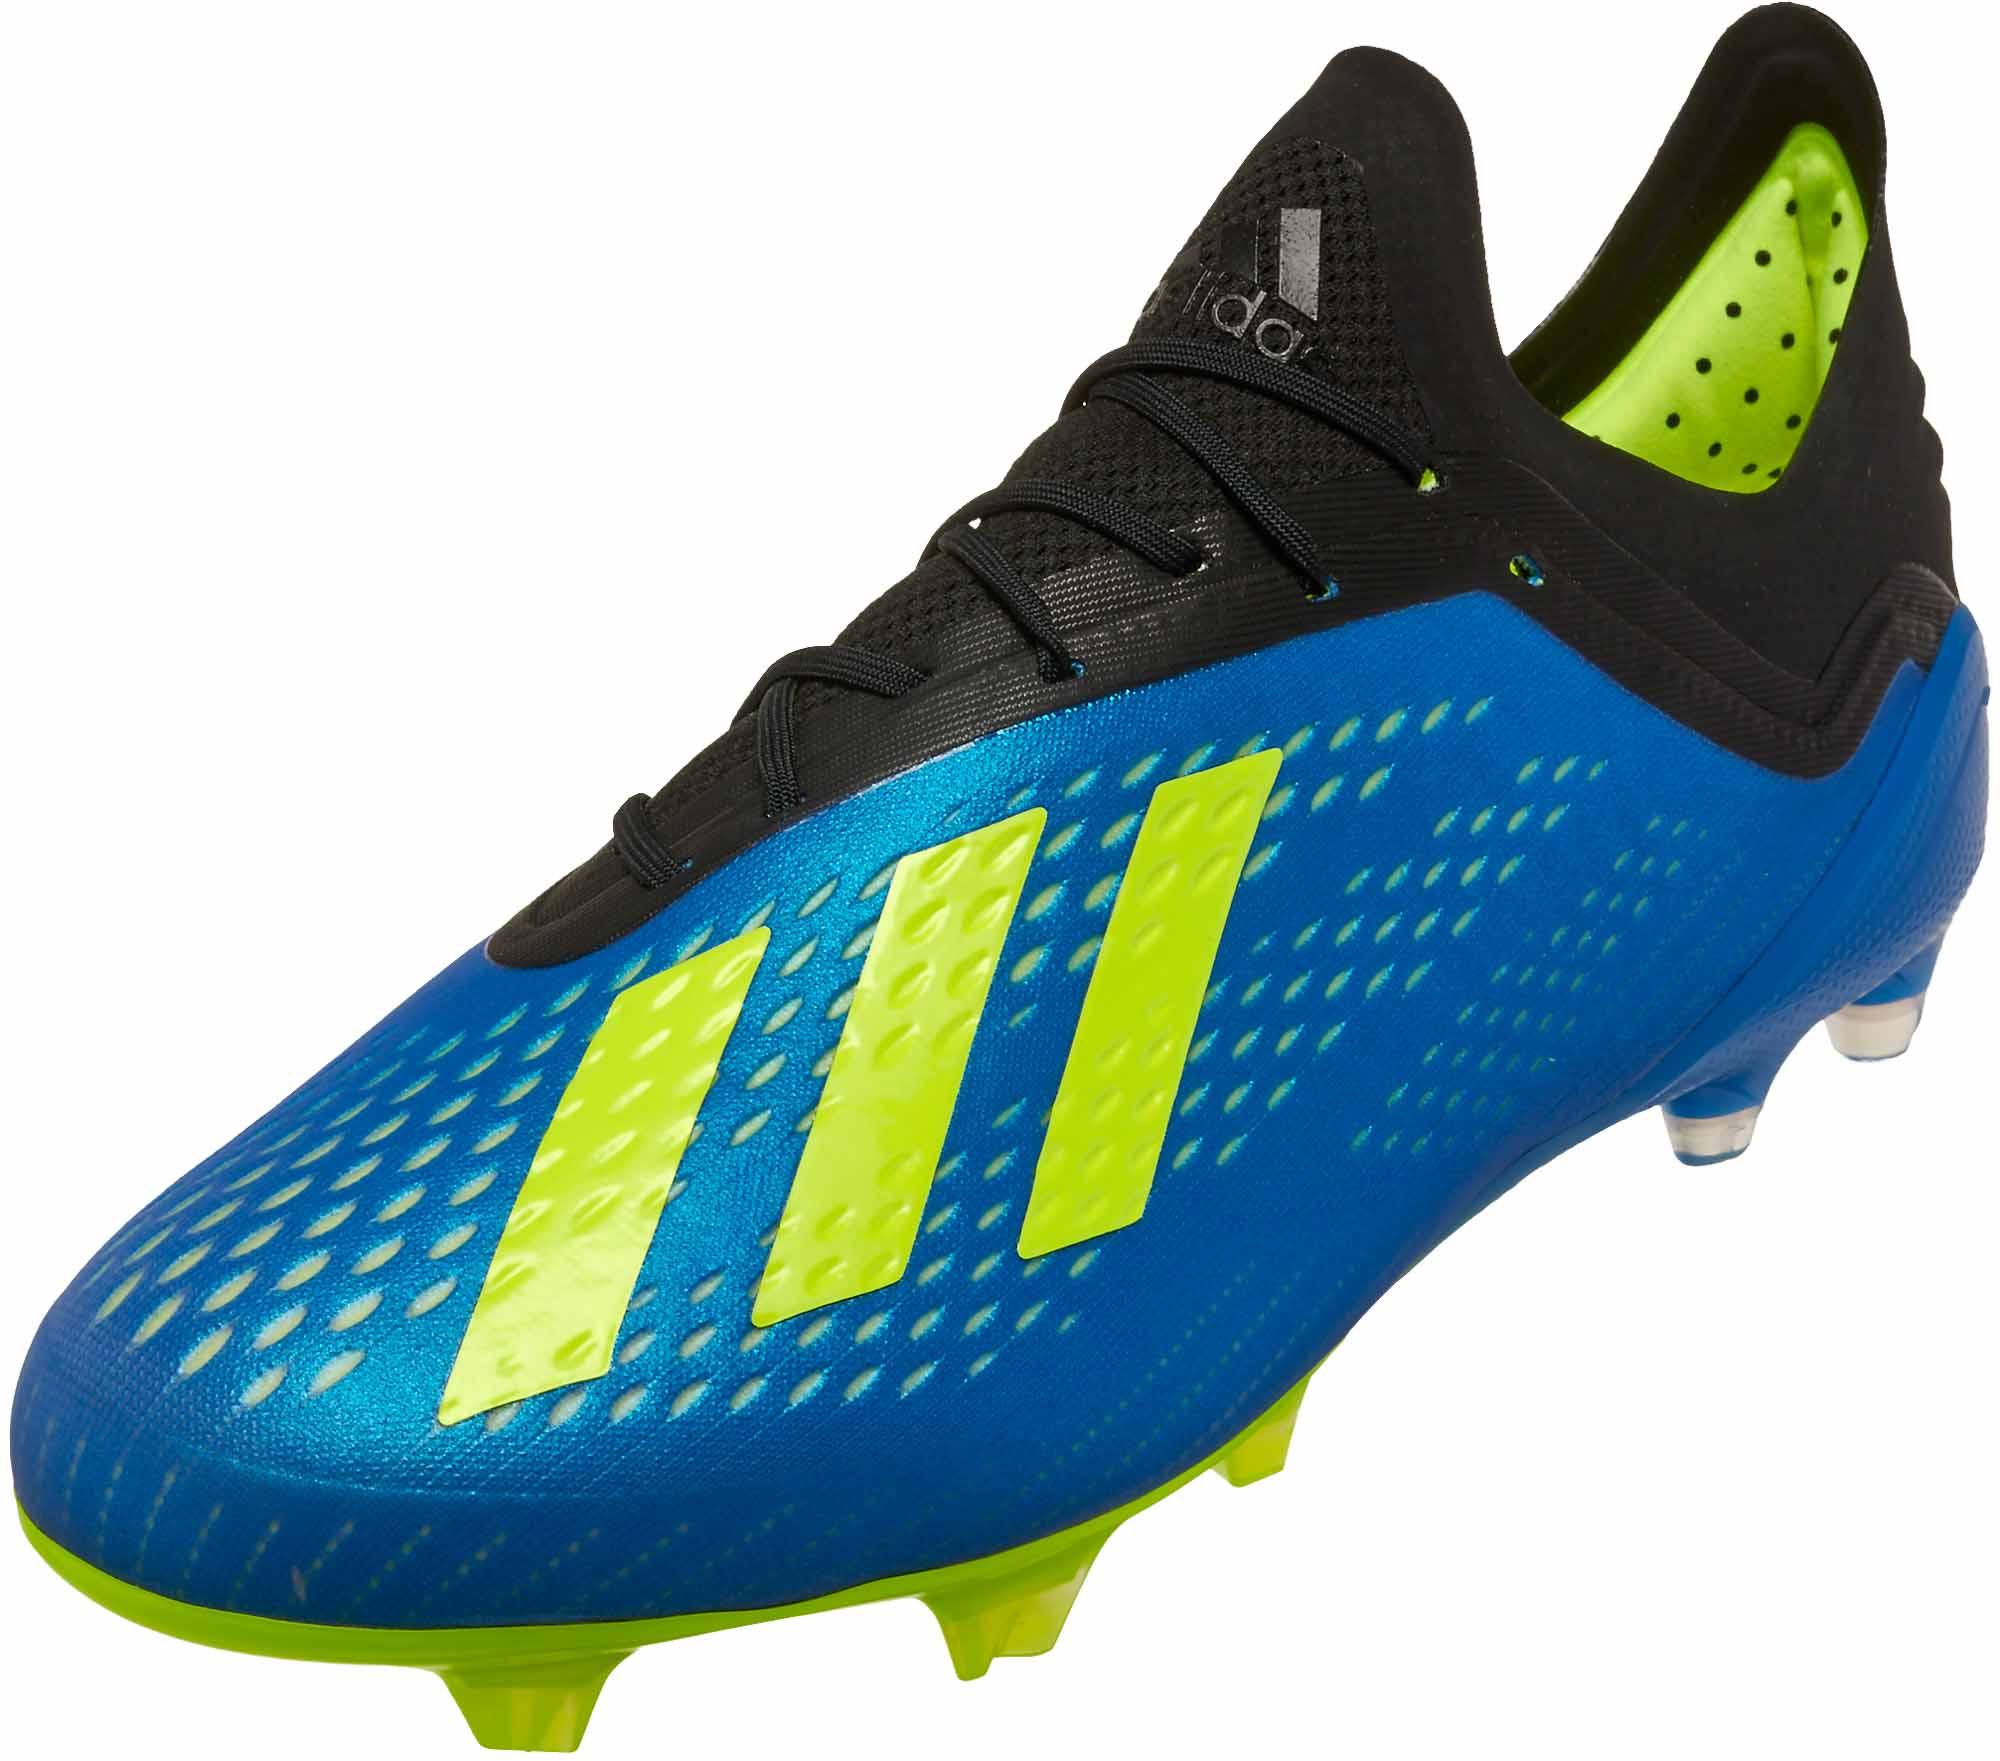 adidas X 18.1 FG - Football Blue Solar Yellow Black - Soccer Master ea1a73e2f90